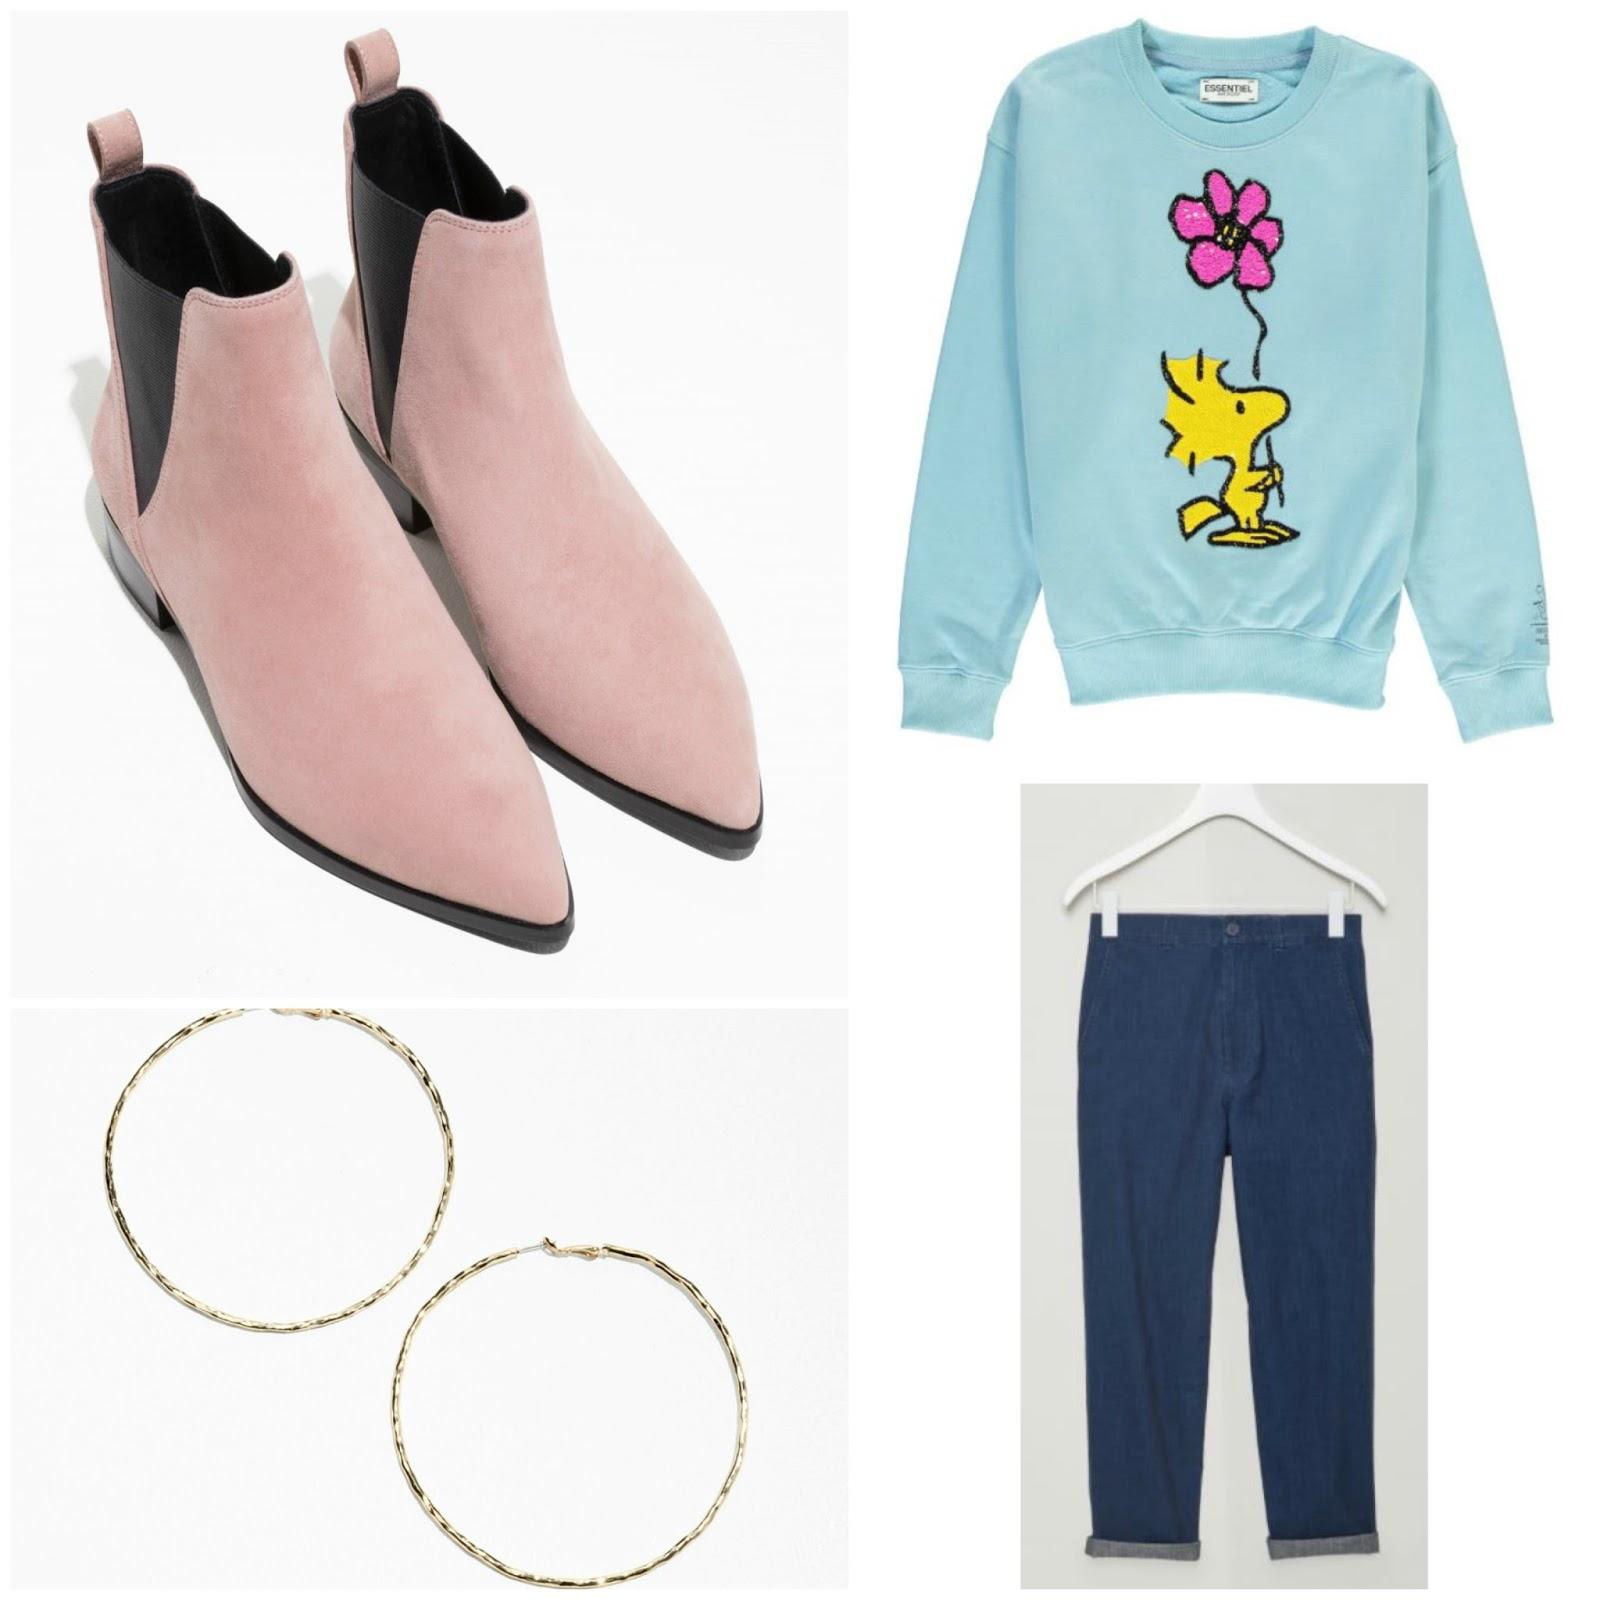 Adding colour to your spring wardrobe